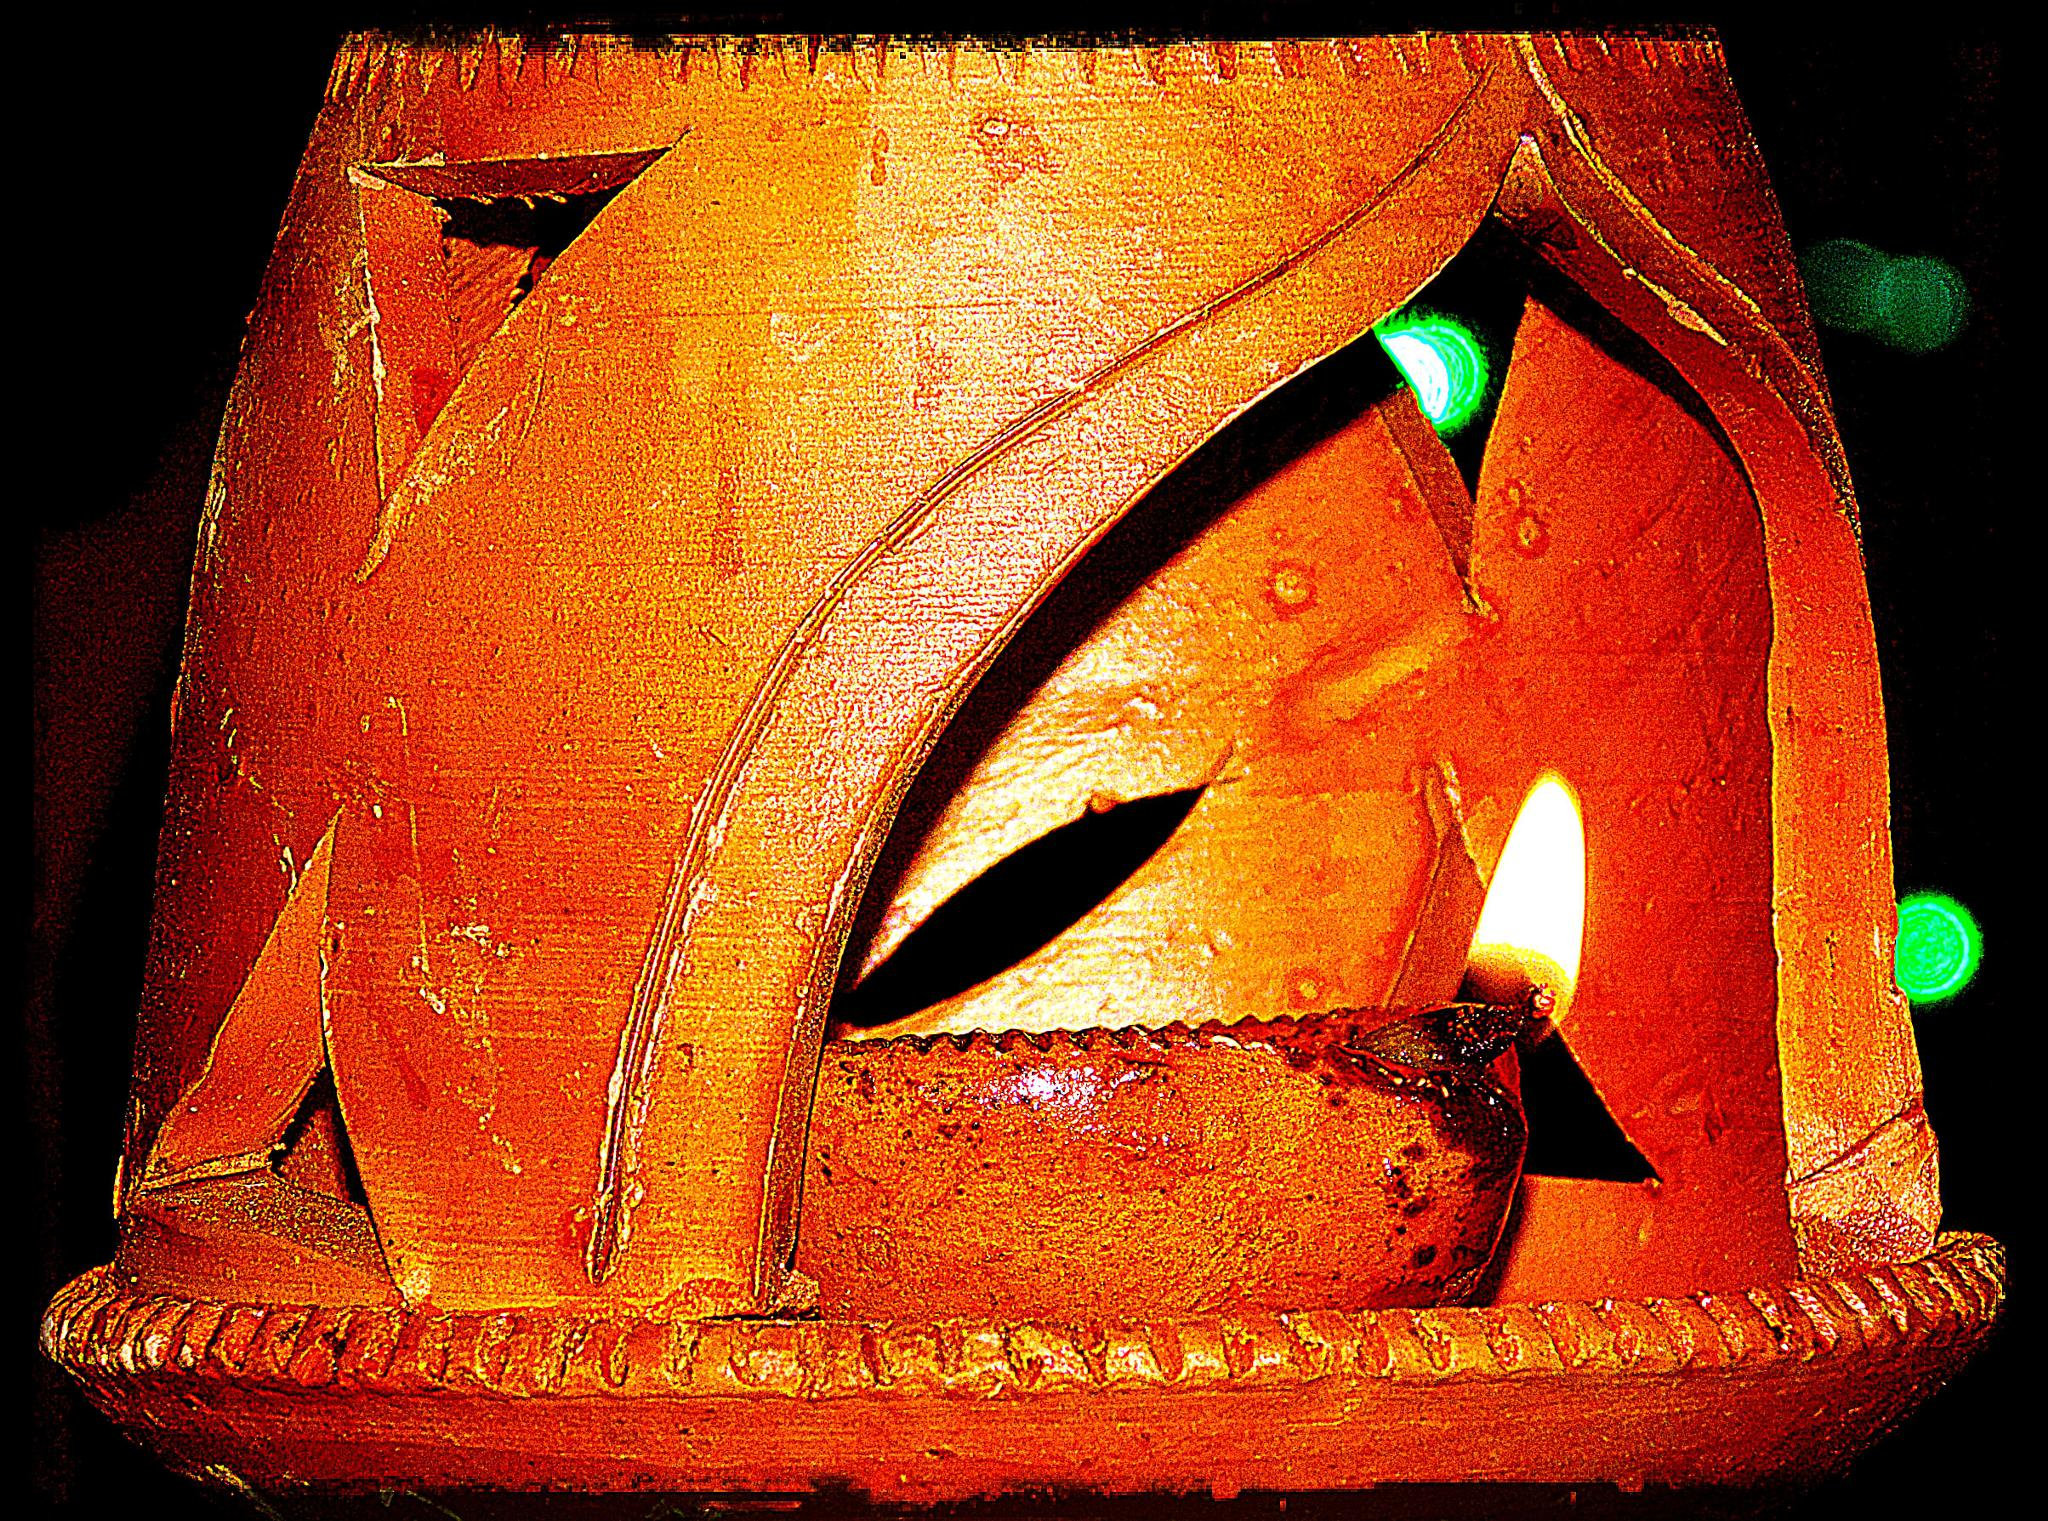 Earthen Lamp by Rana Sarkar